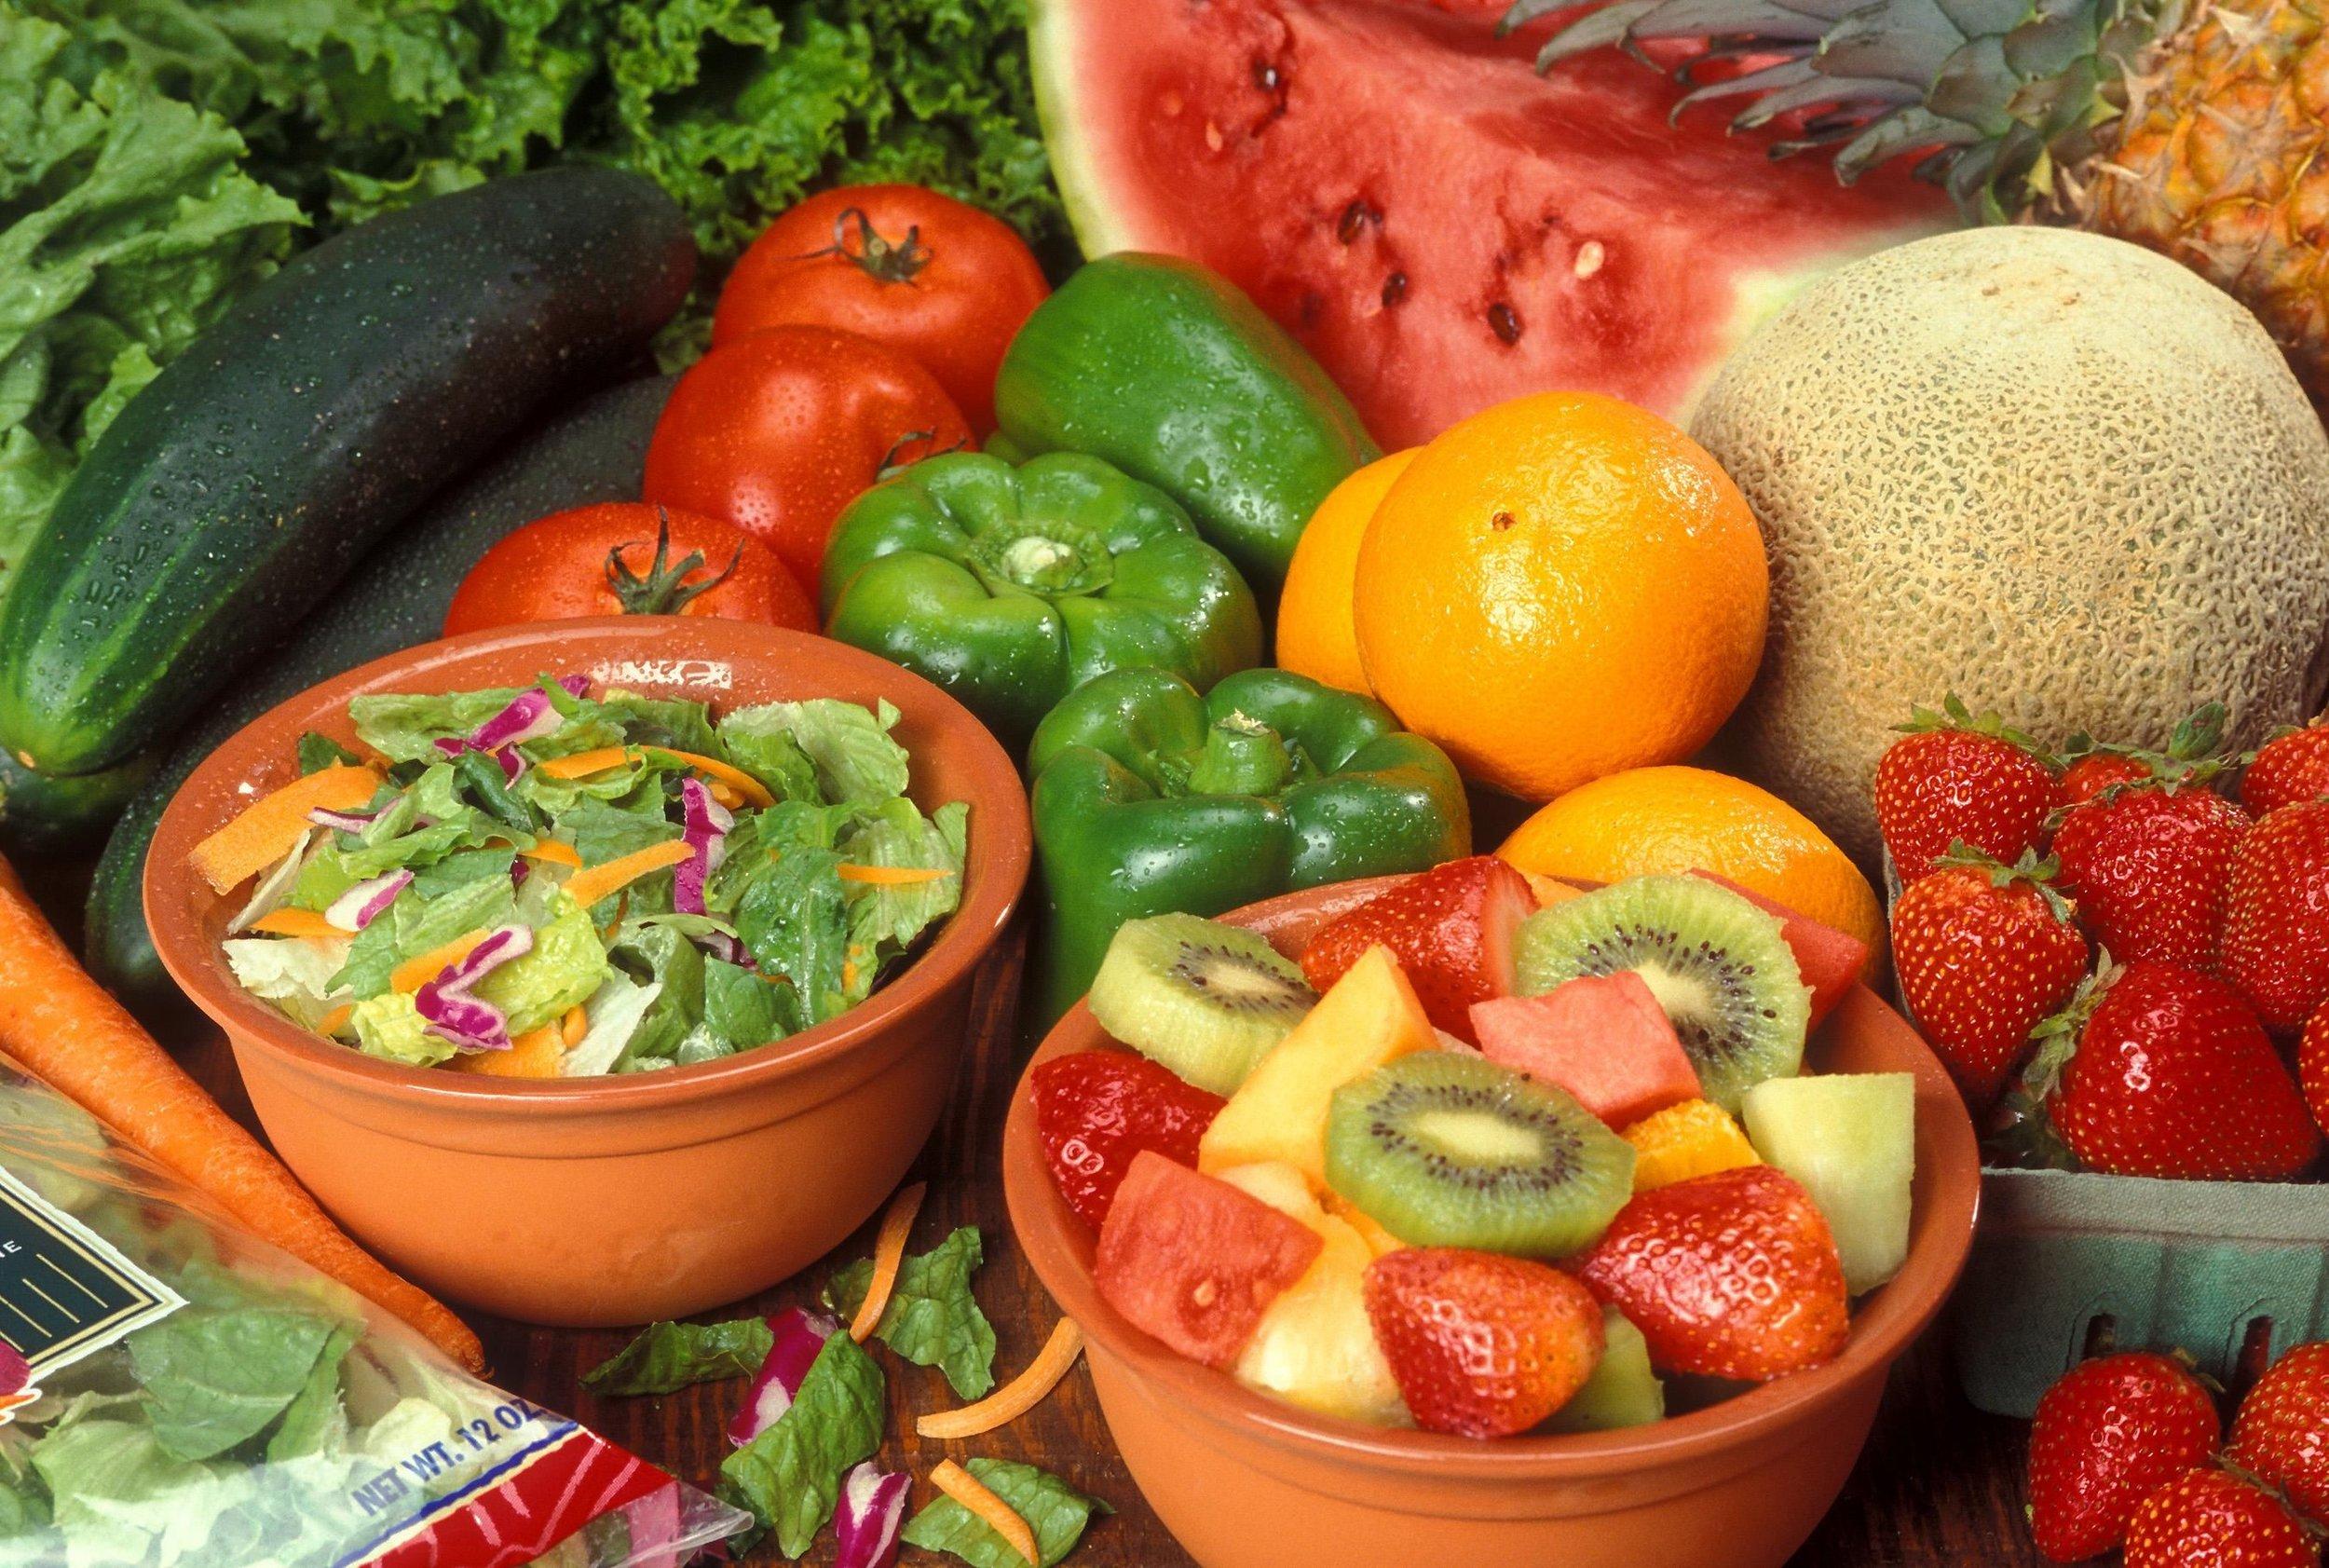 Fresh_cut_fruits_and_vegetables.jpg